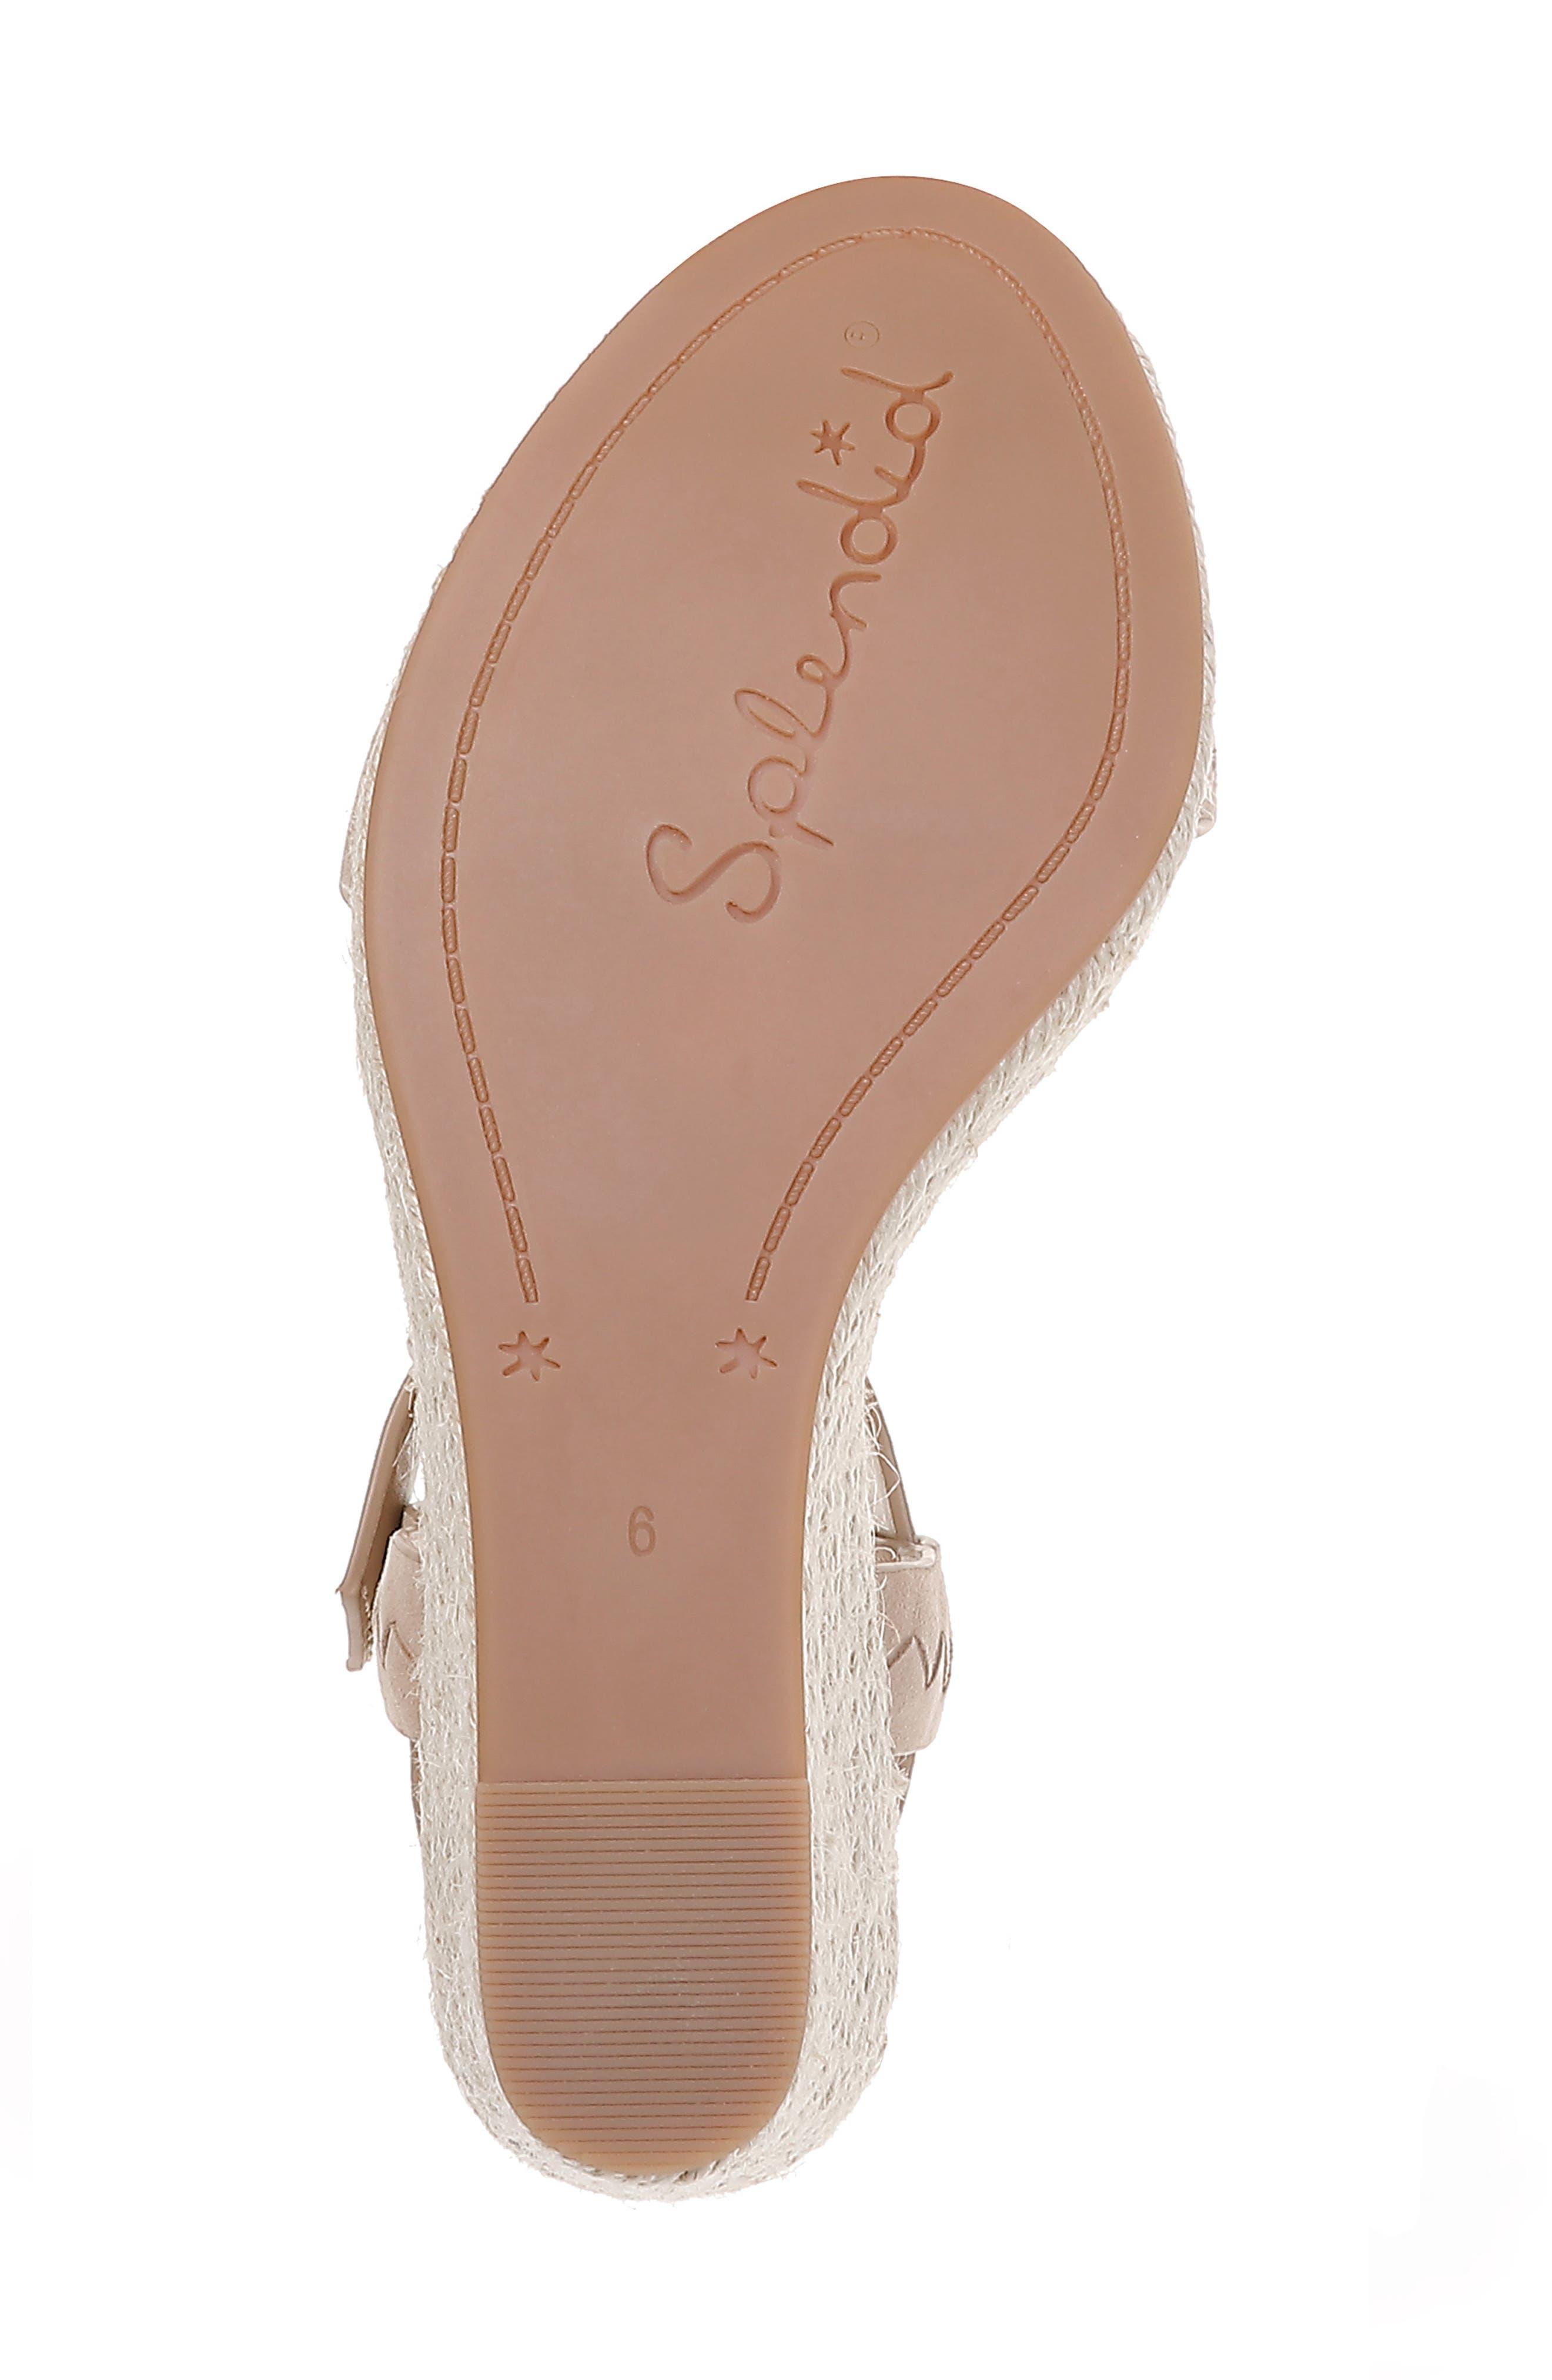 SPLENDID, Shayla Woven Wedge Sandal, Alternate thumbnail 6, color, WOOD SUEDE